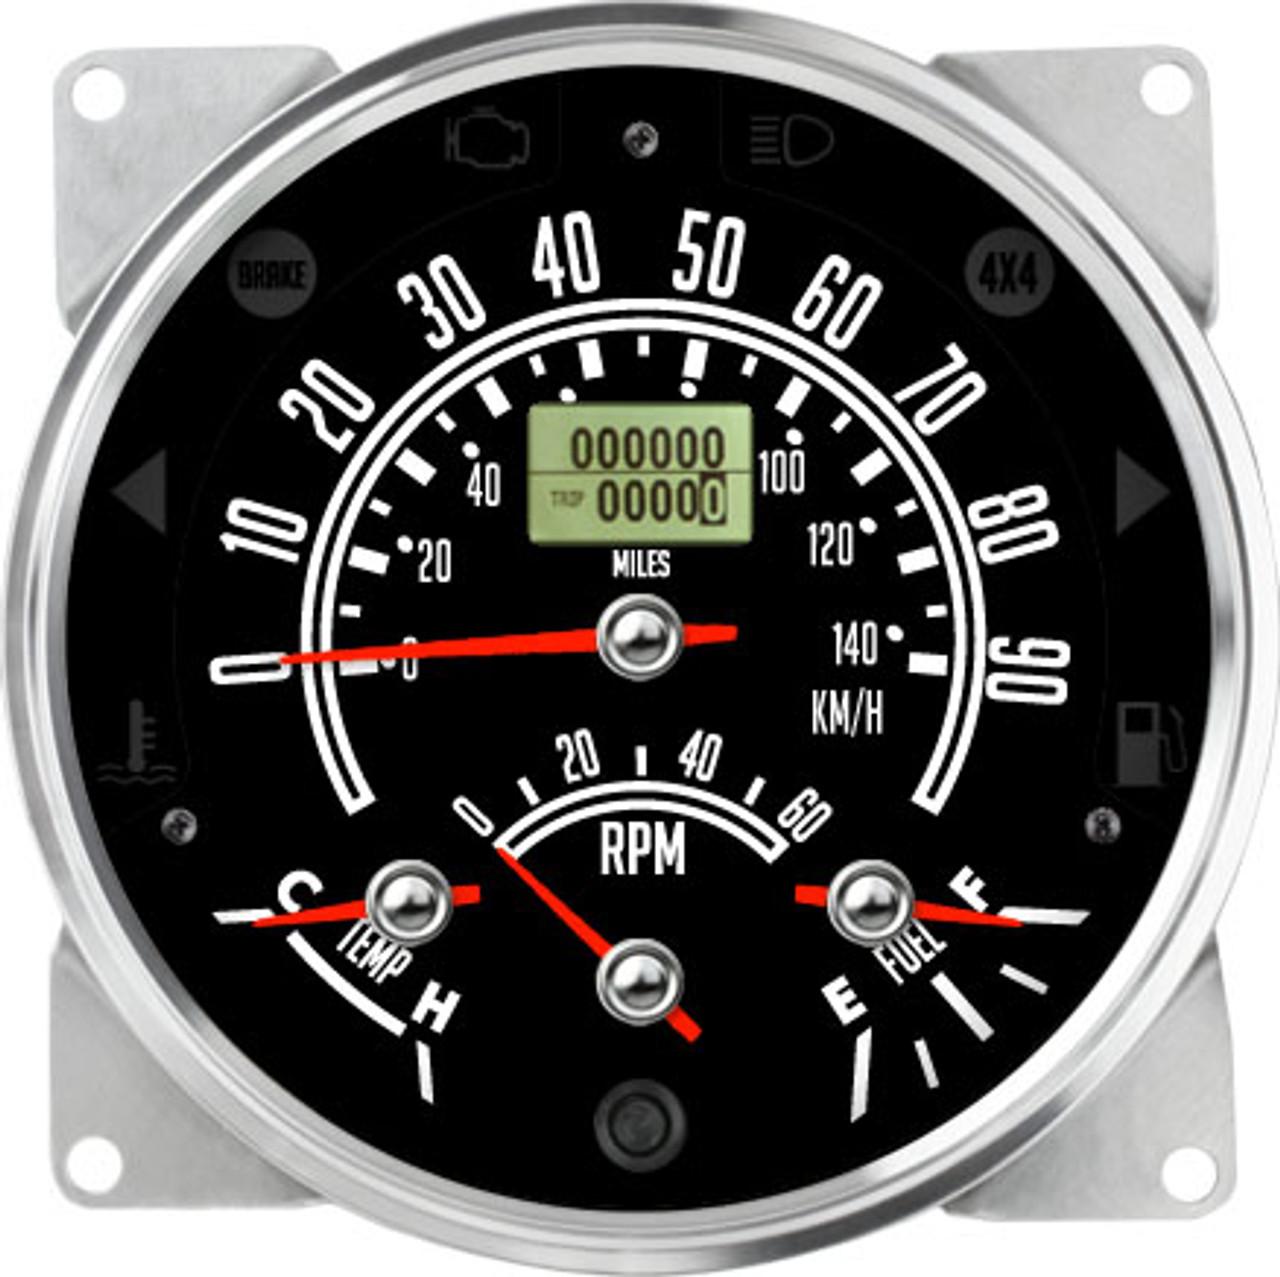 "5-1/2"" CJ Jeep GPS Speedometer Cluster 90mph/140KMH with Tachometer- Speedo, Fuel Level, Temp, Tach"